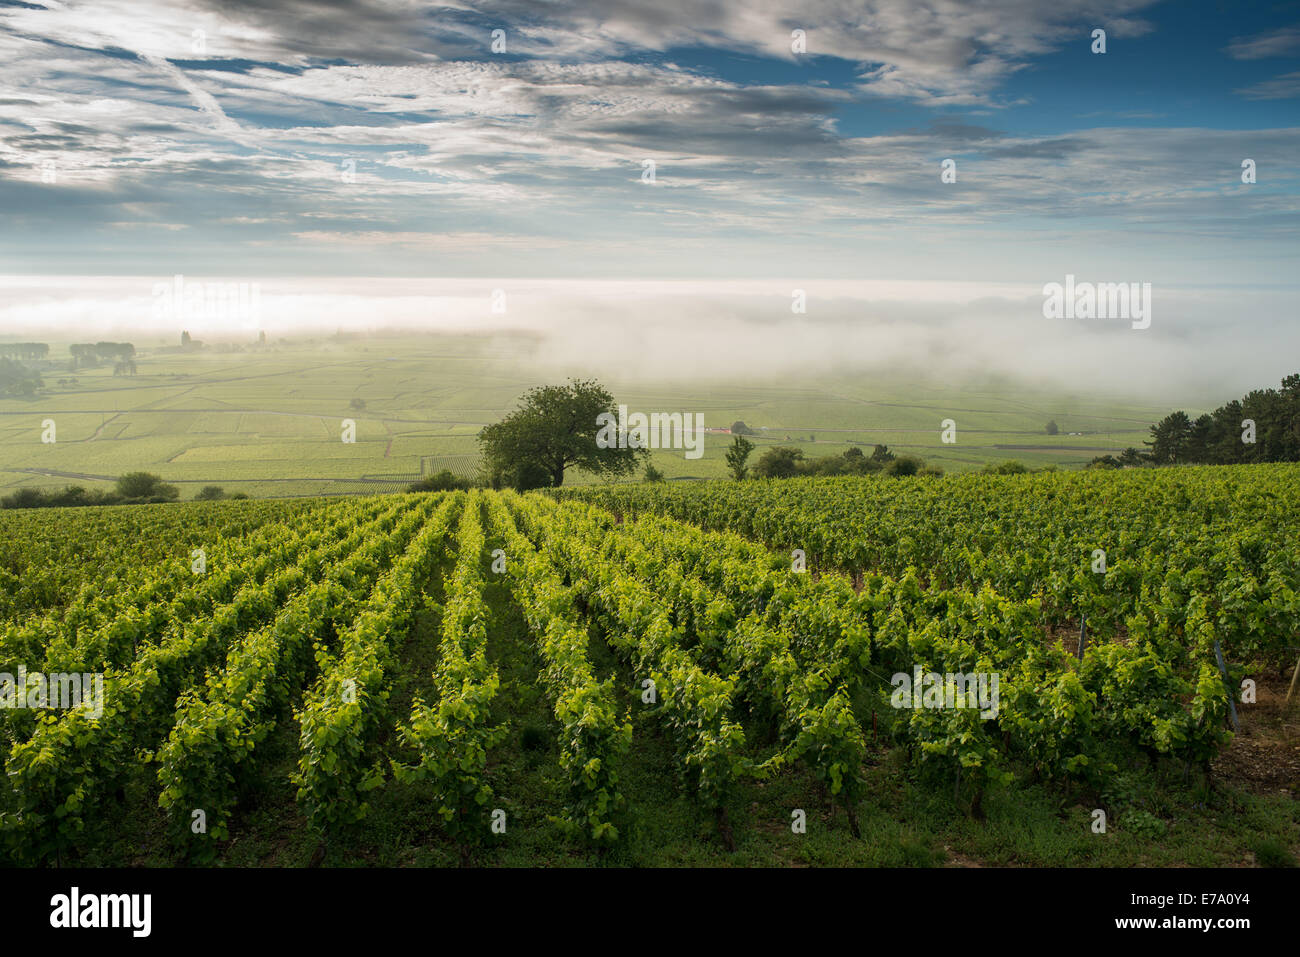 Vineyard. Pommard, Cote de Beaune, d'Or, Burgundy, France - Stock Image